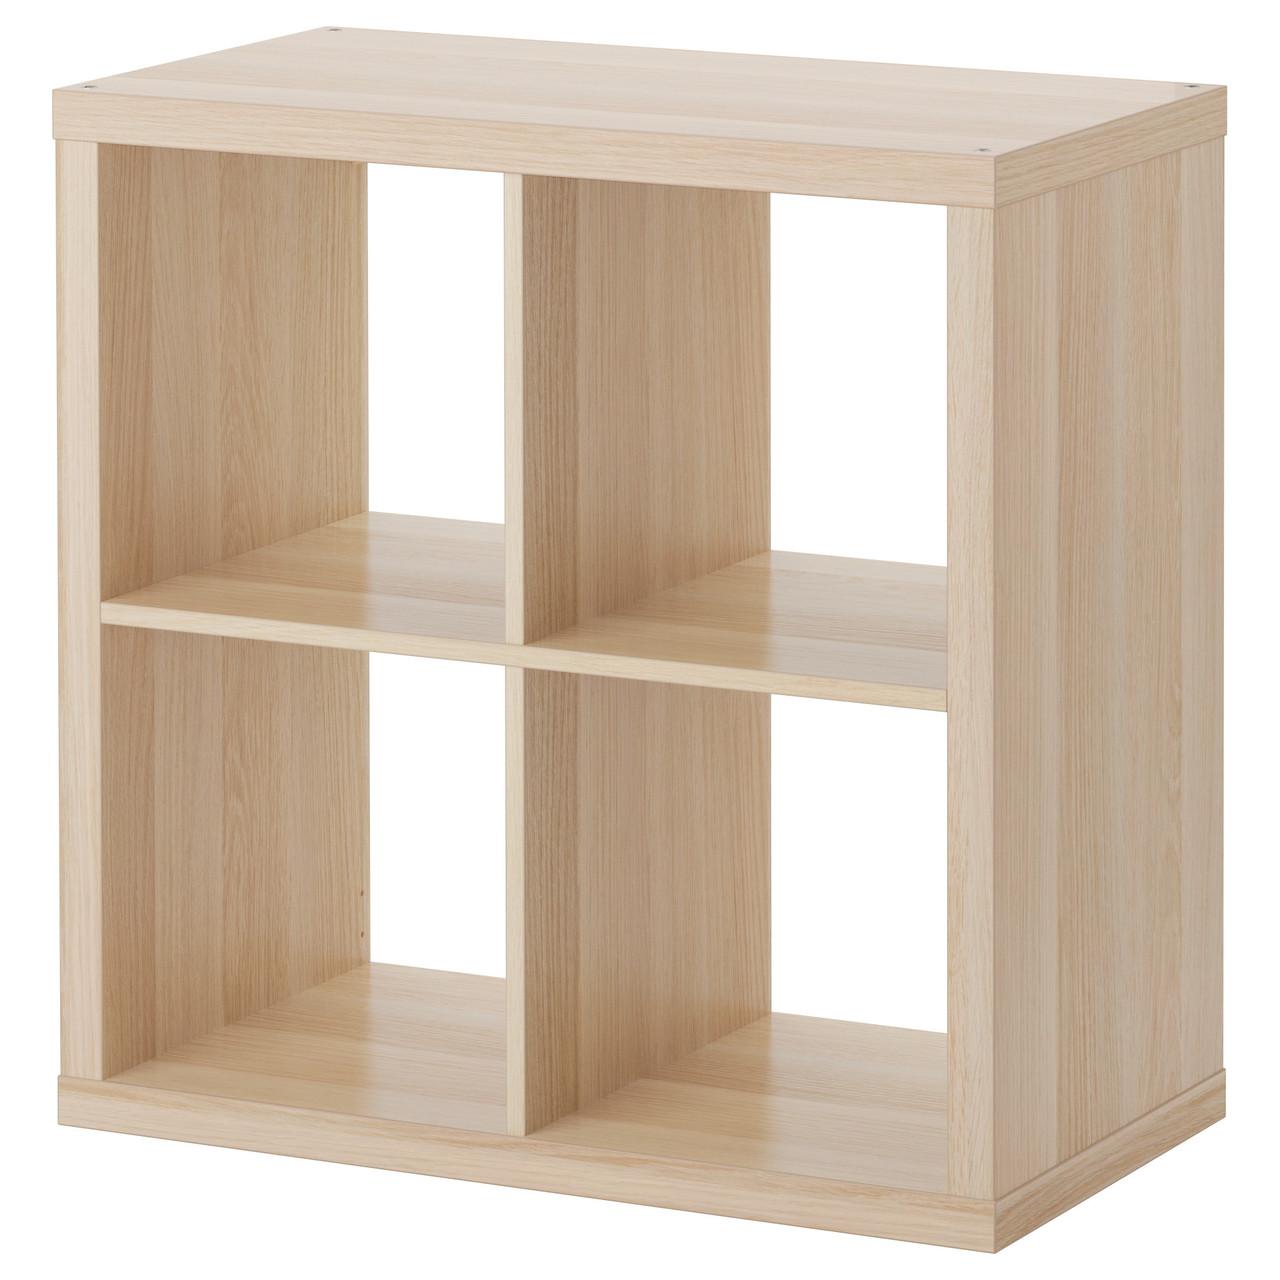 KALLAX Книжный шкаф, ef дуба морилок биа 603.245.20